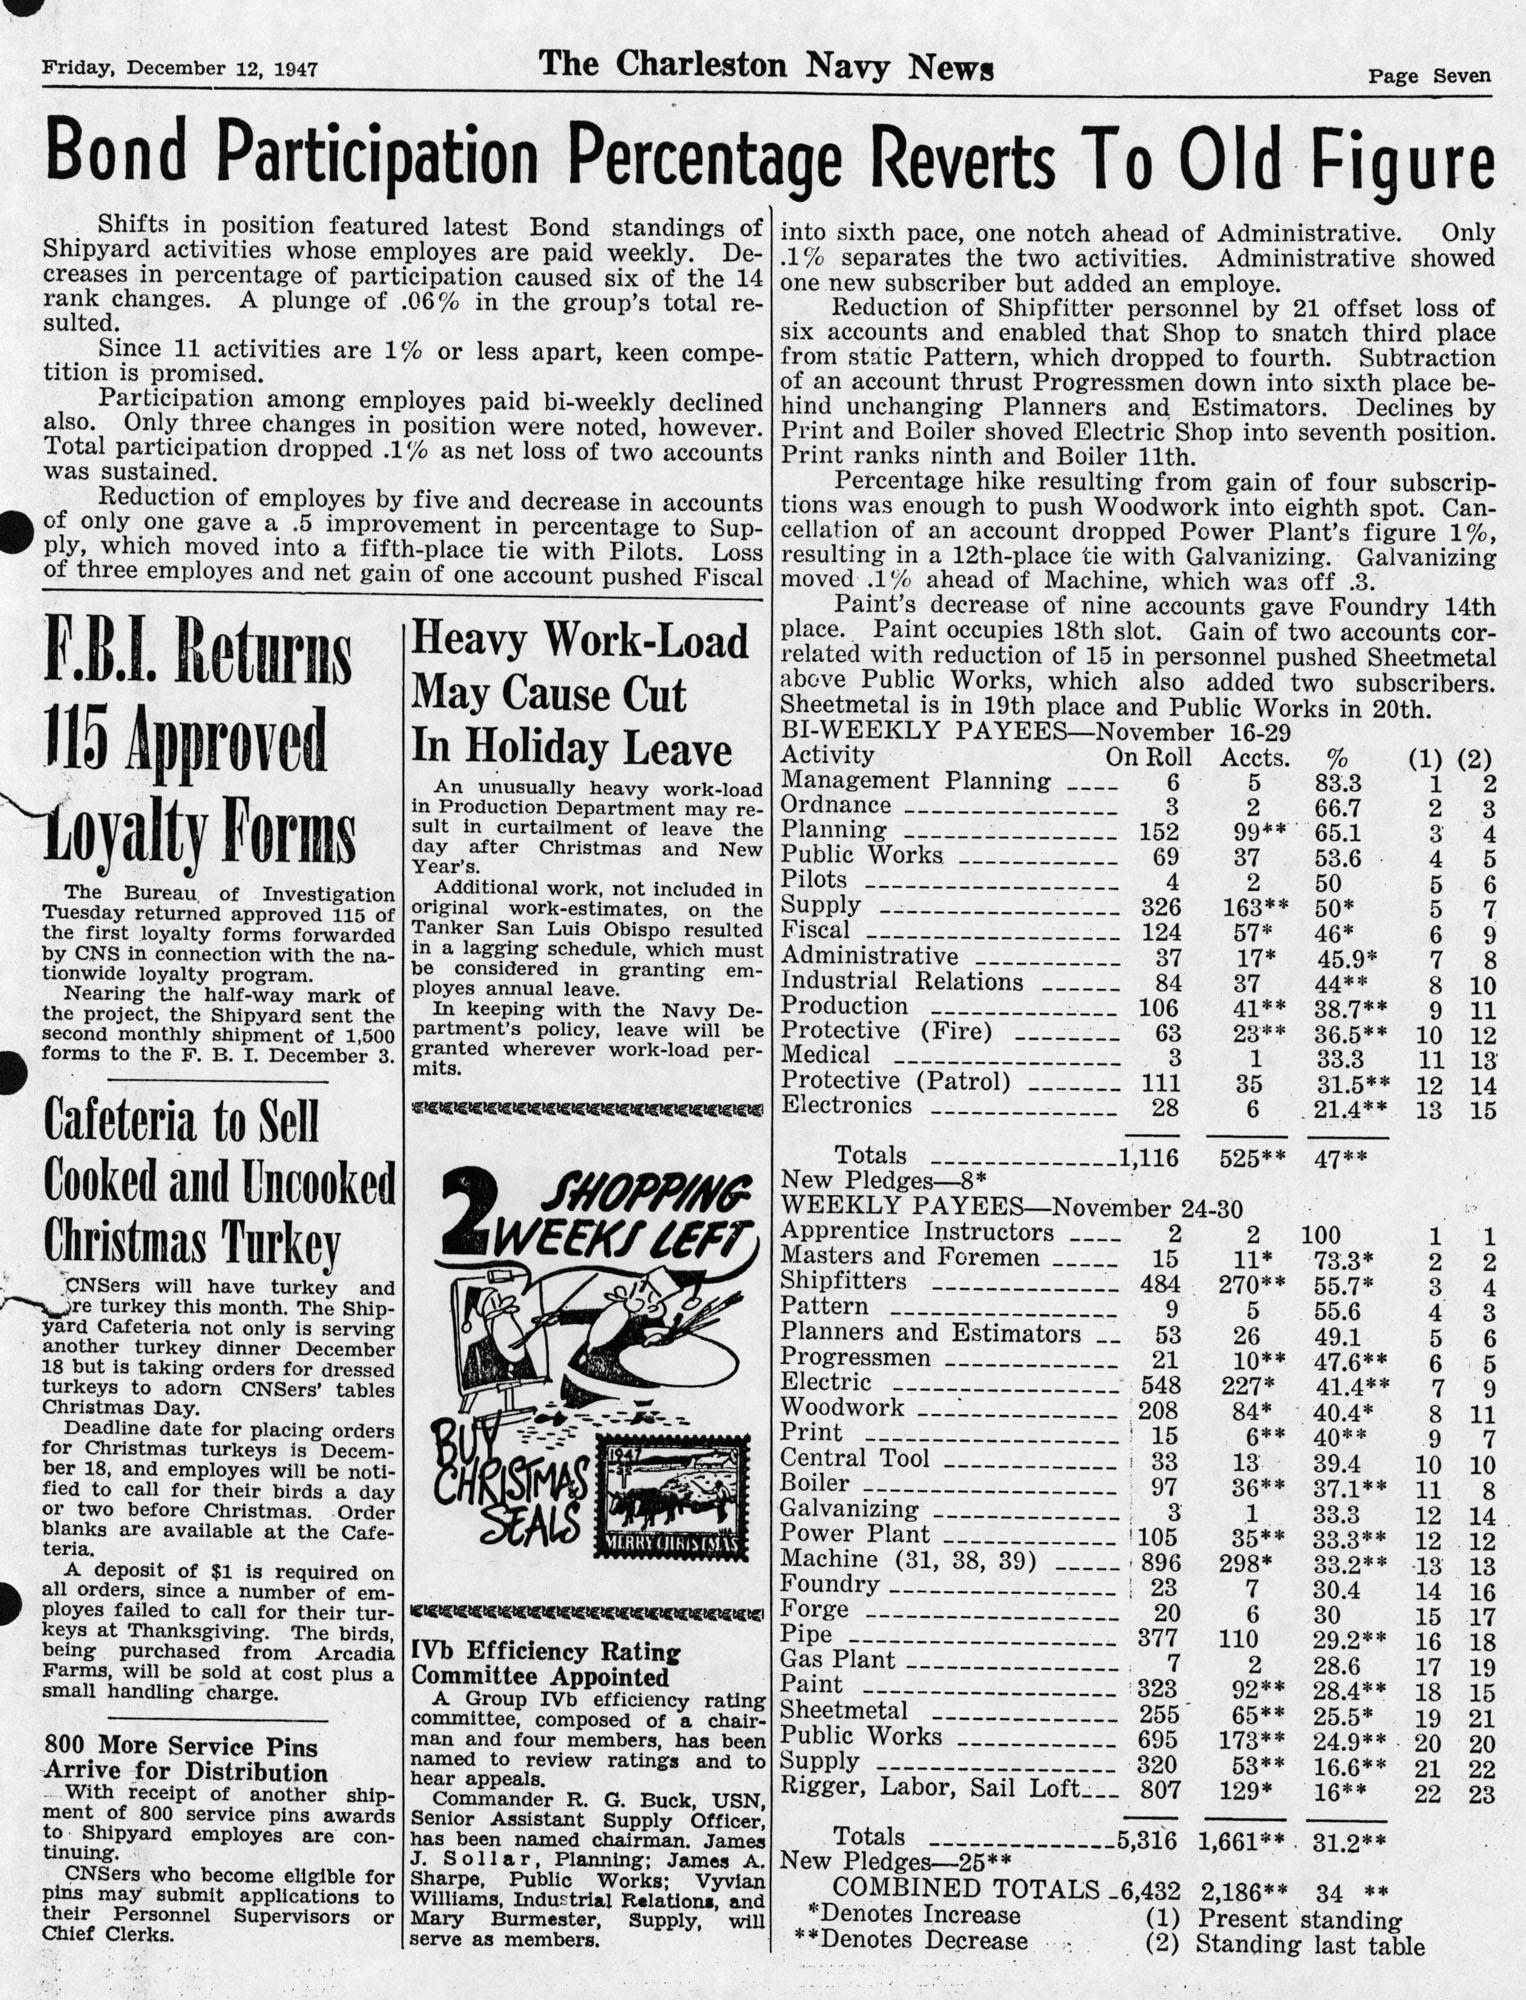 The Charleston Navy News, Volume 6, Edition 10, page vii